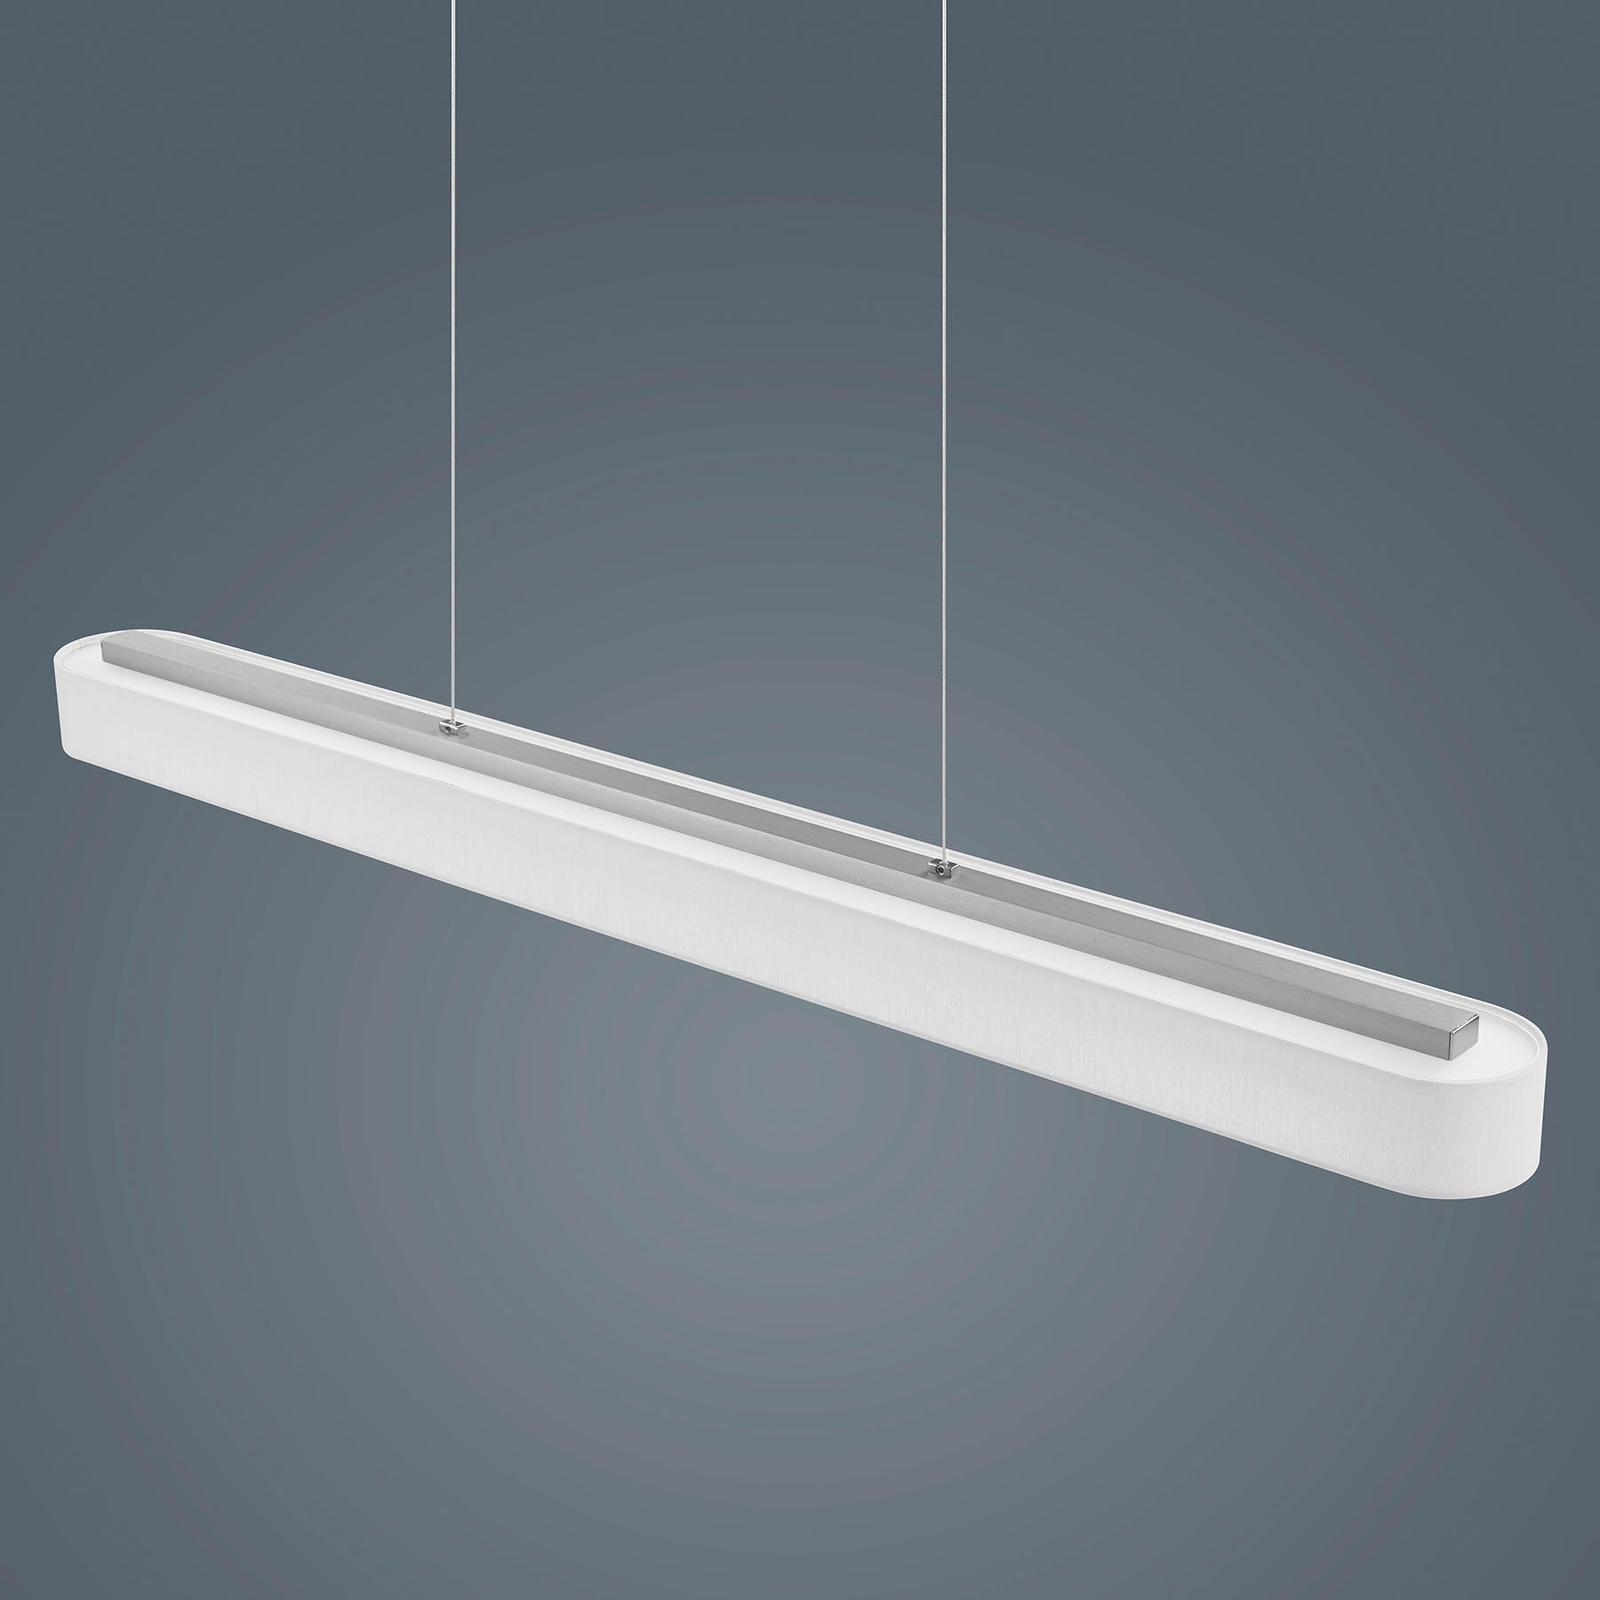 Helestra Bora hanglamp 101,5 cm kap wit